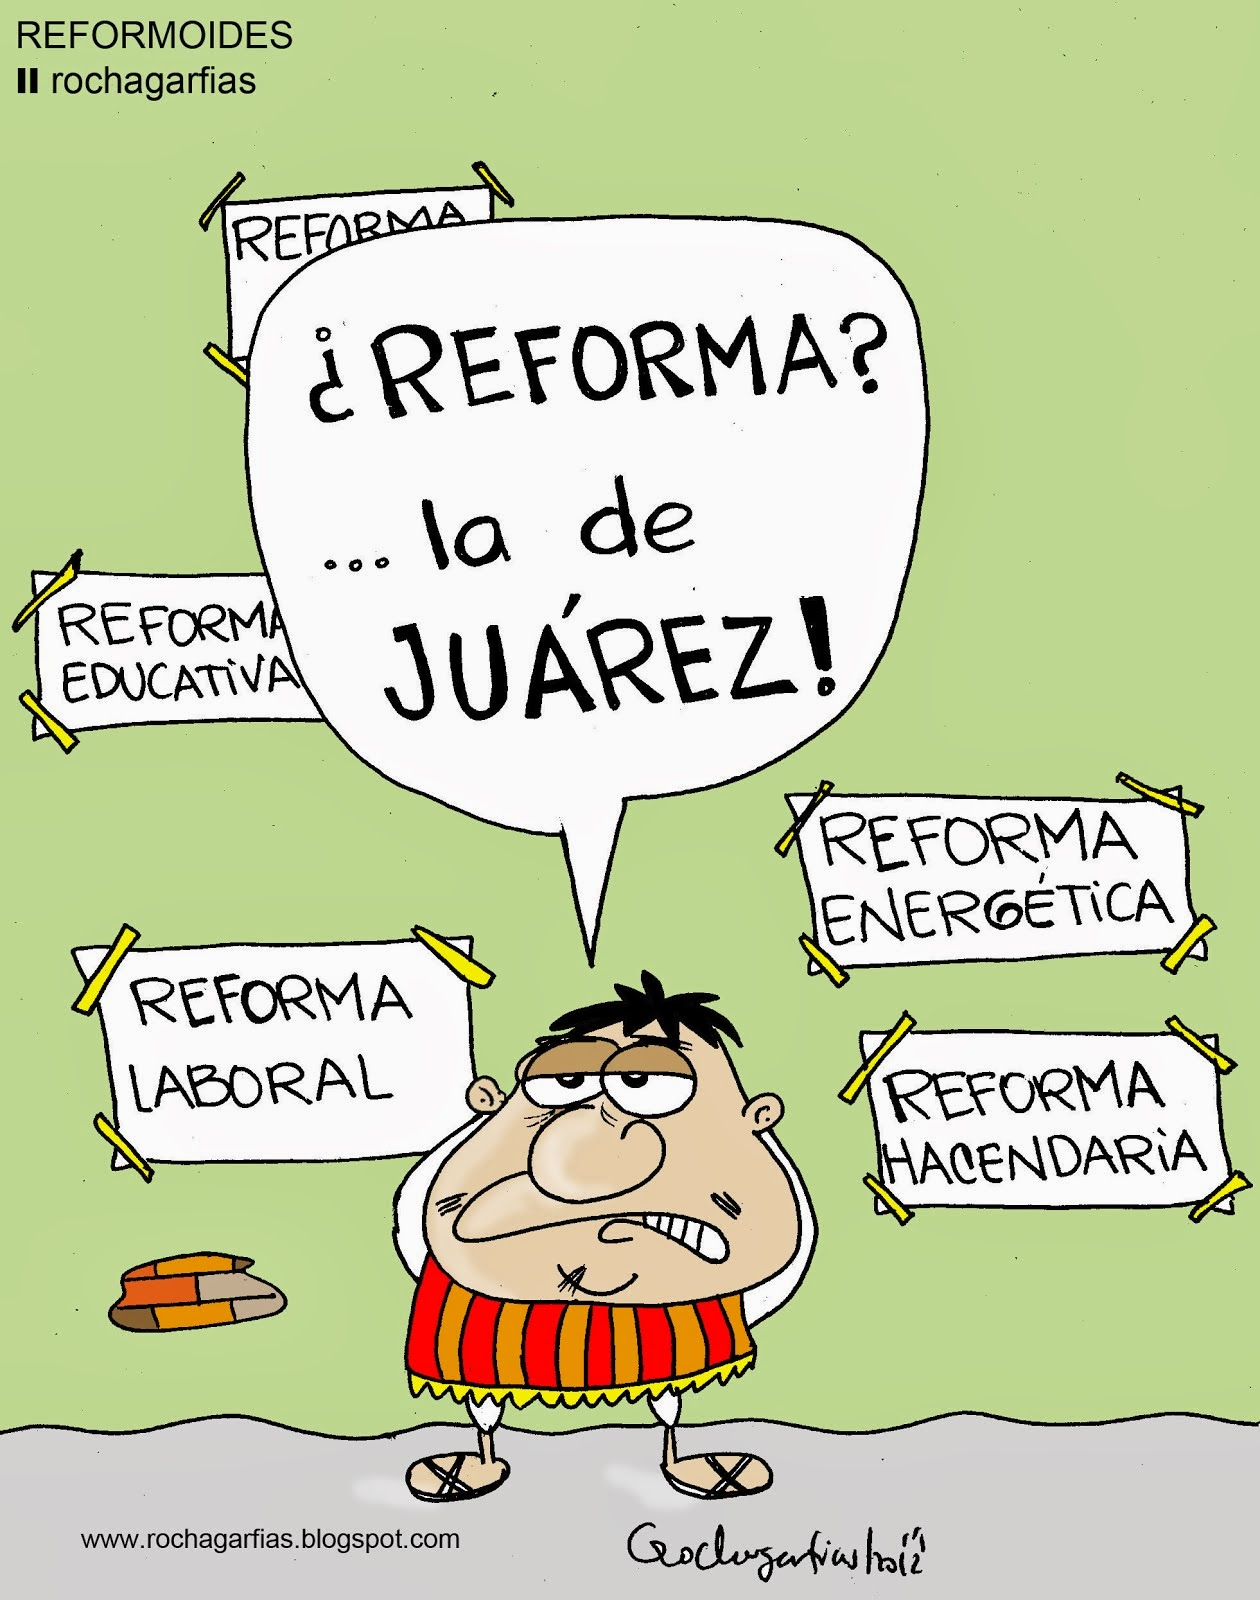 REFORMOIDES. ¿Reforma?...la de Juárez.